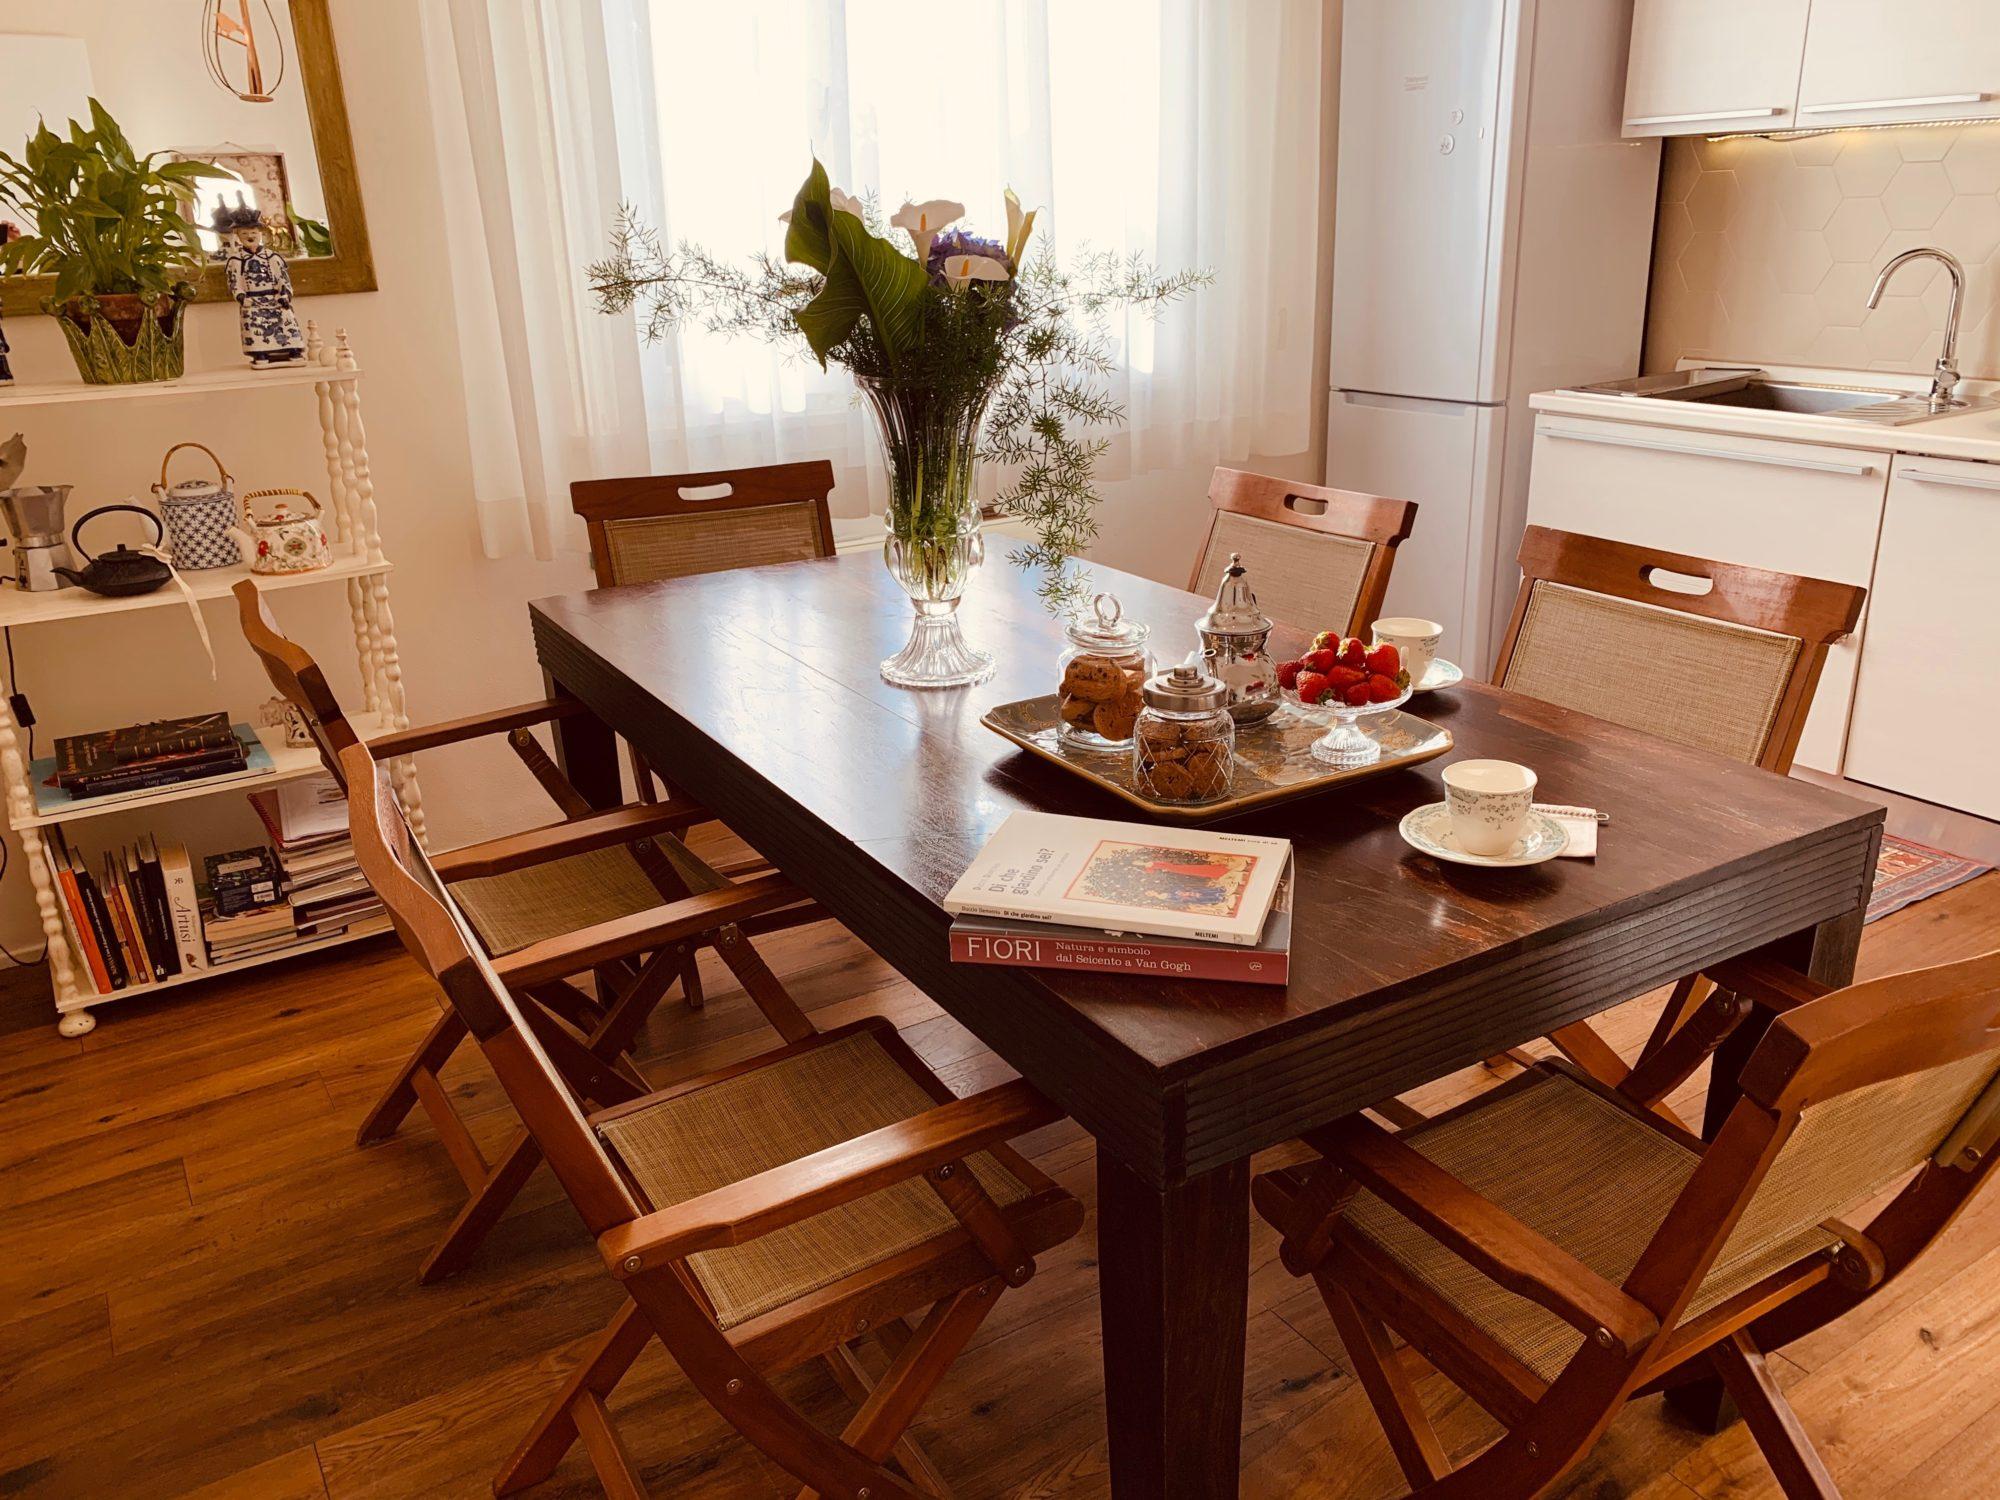 La Fragola de Bosch - Bed & Breakfast 2